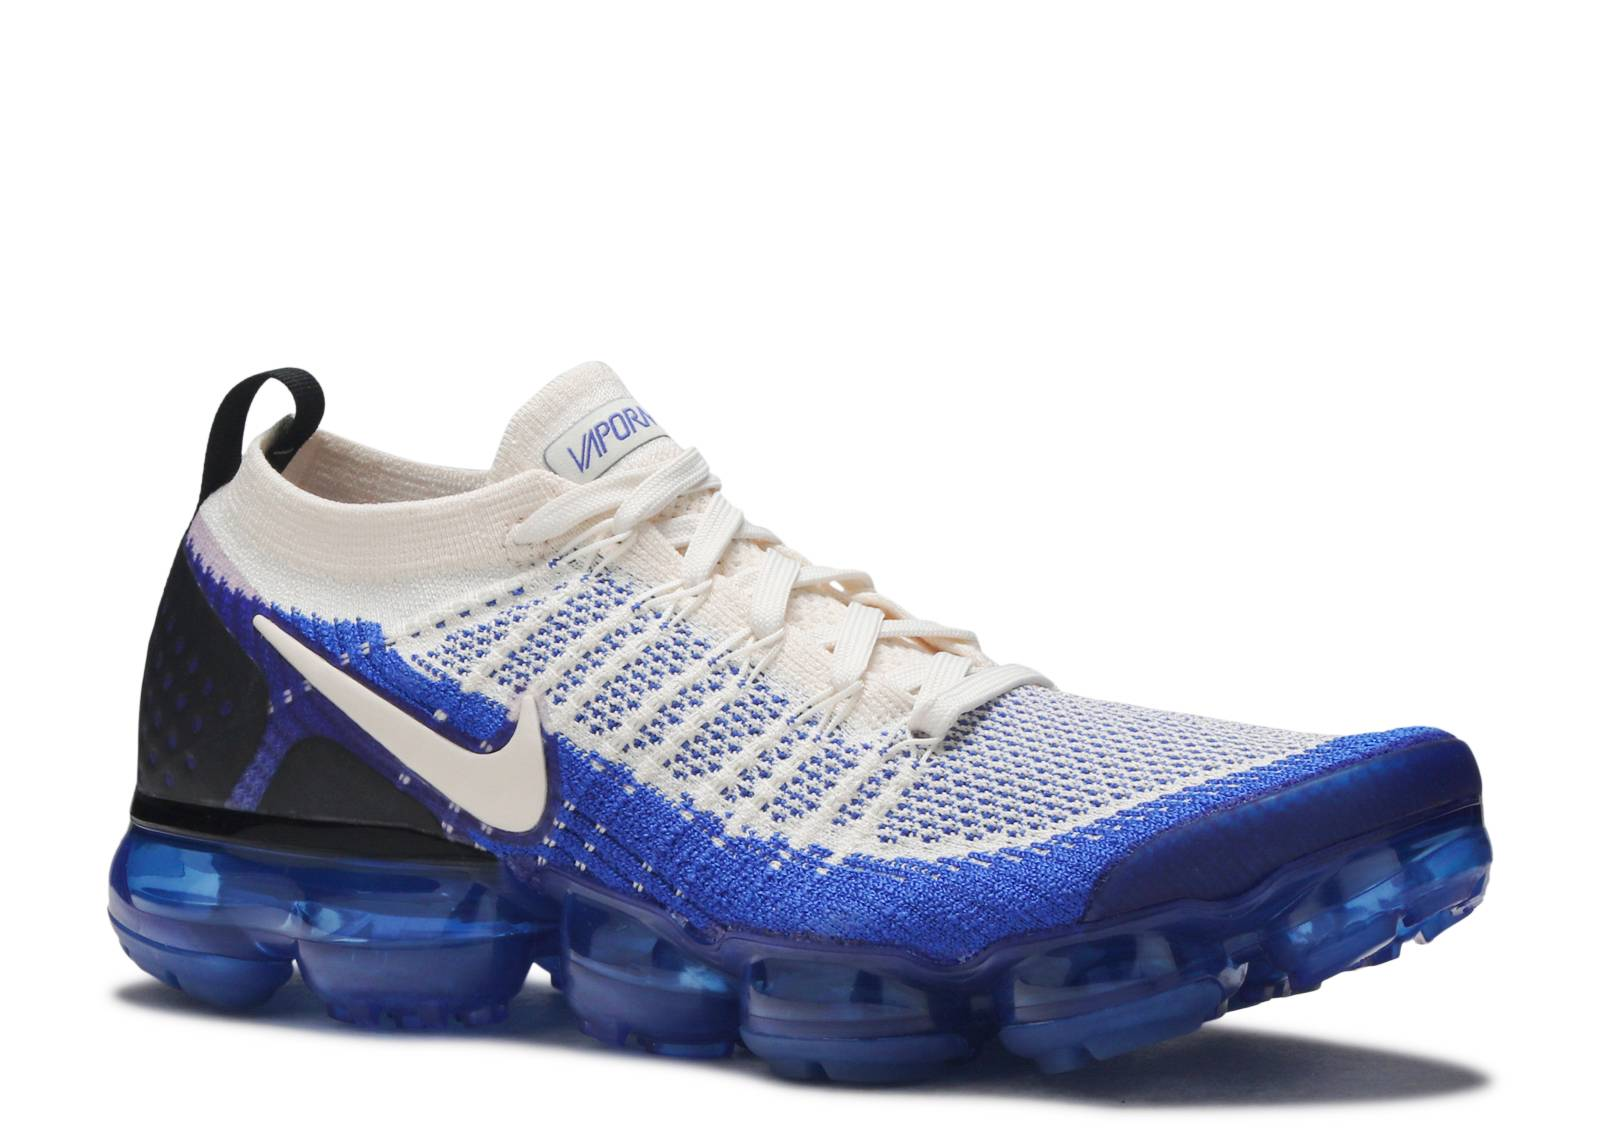 b7595f46801 Nike Air Vapormax Flyknit 2